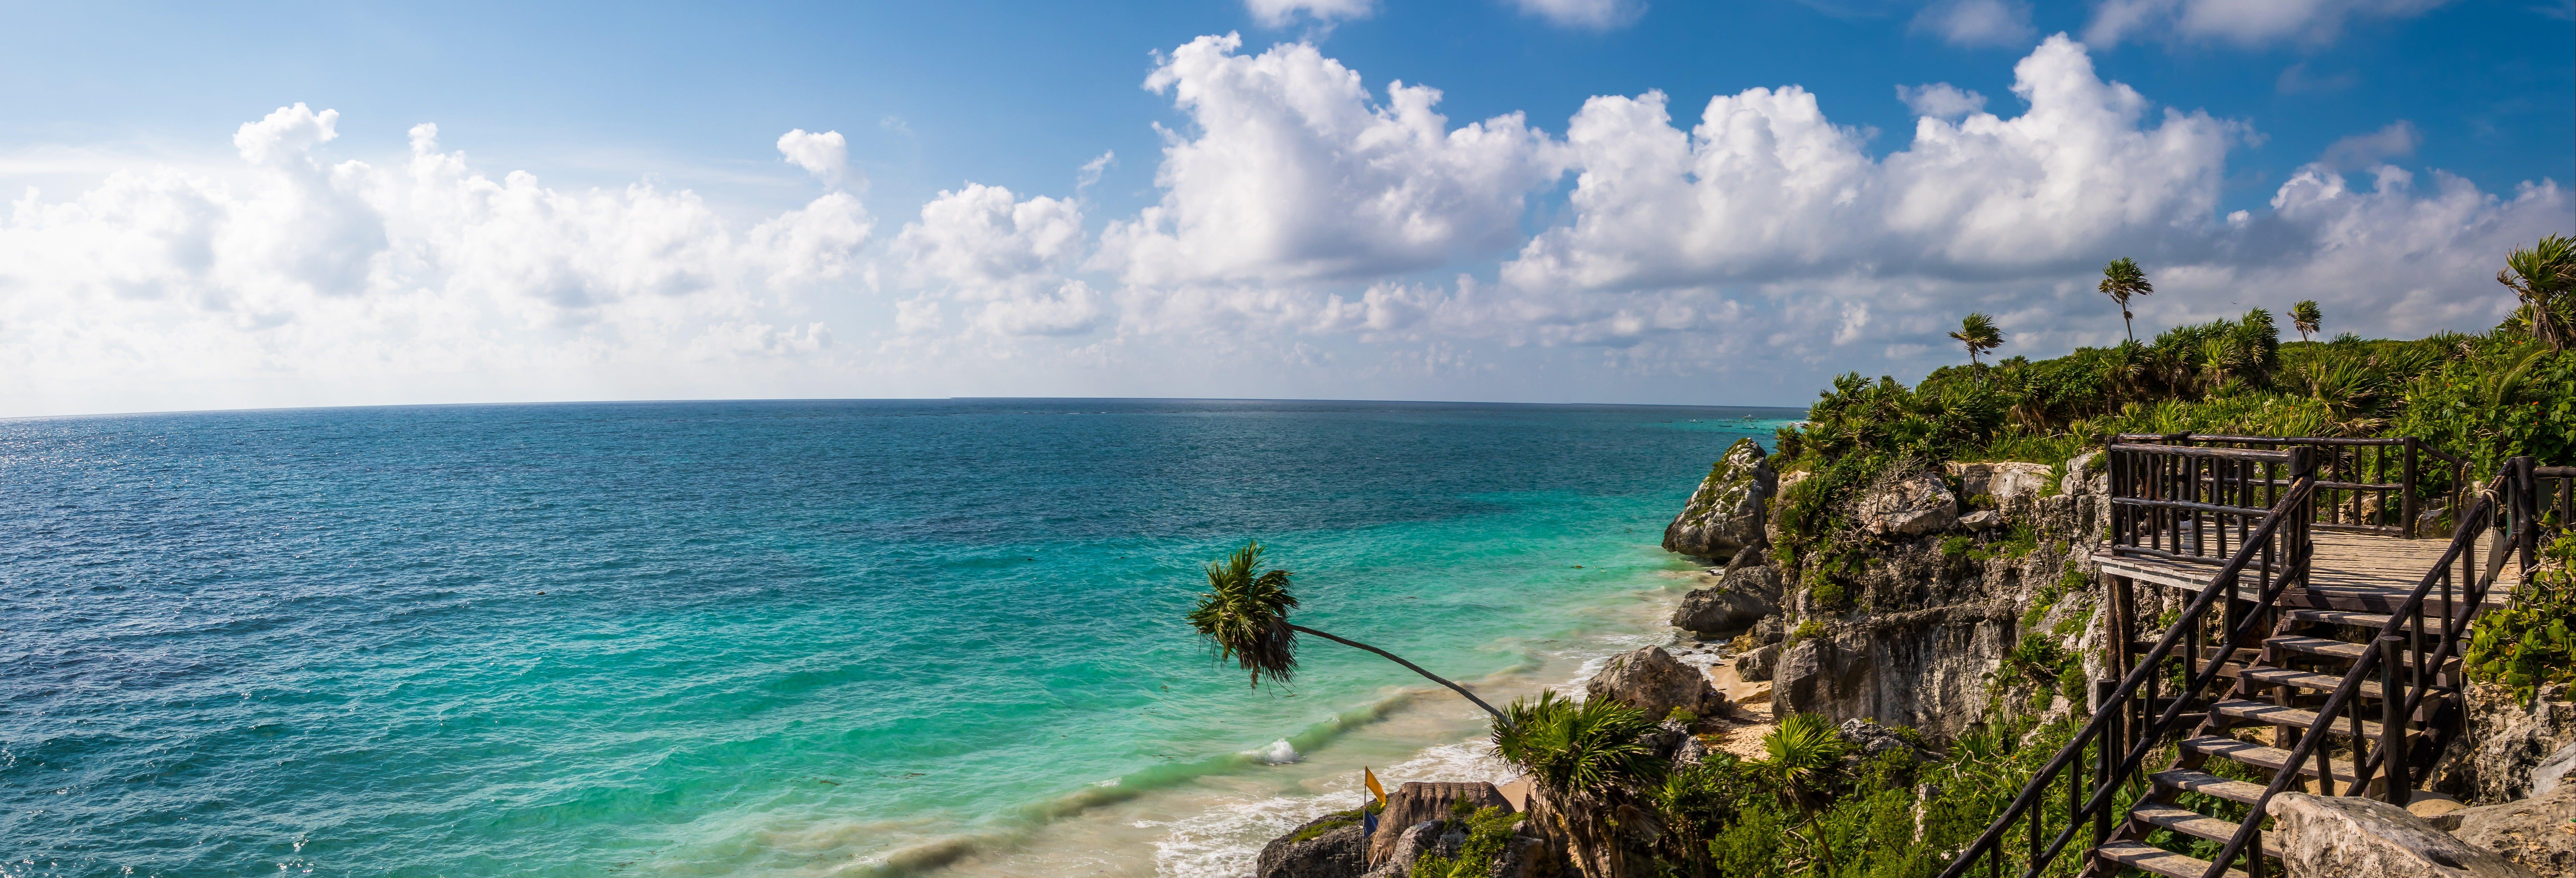 Tulum Ruins & Cenote Snorkelling Tour